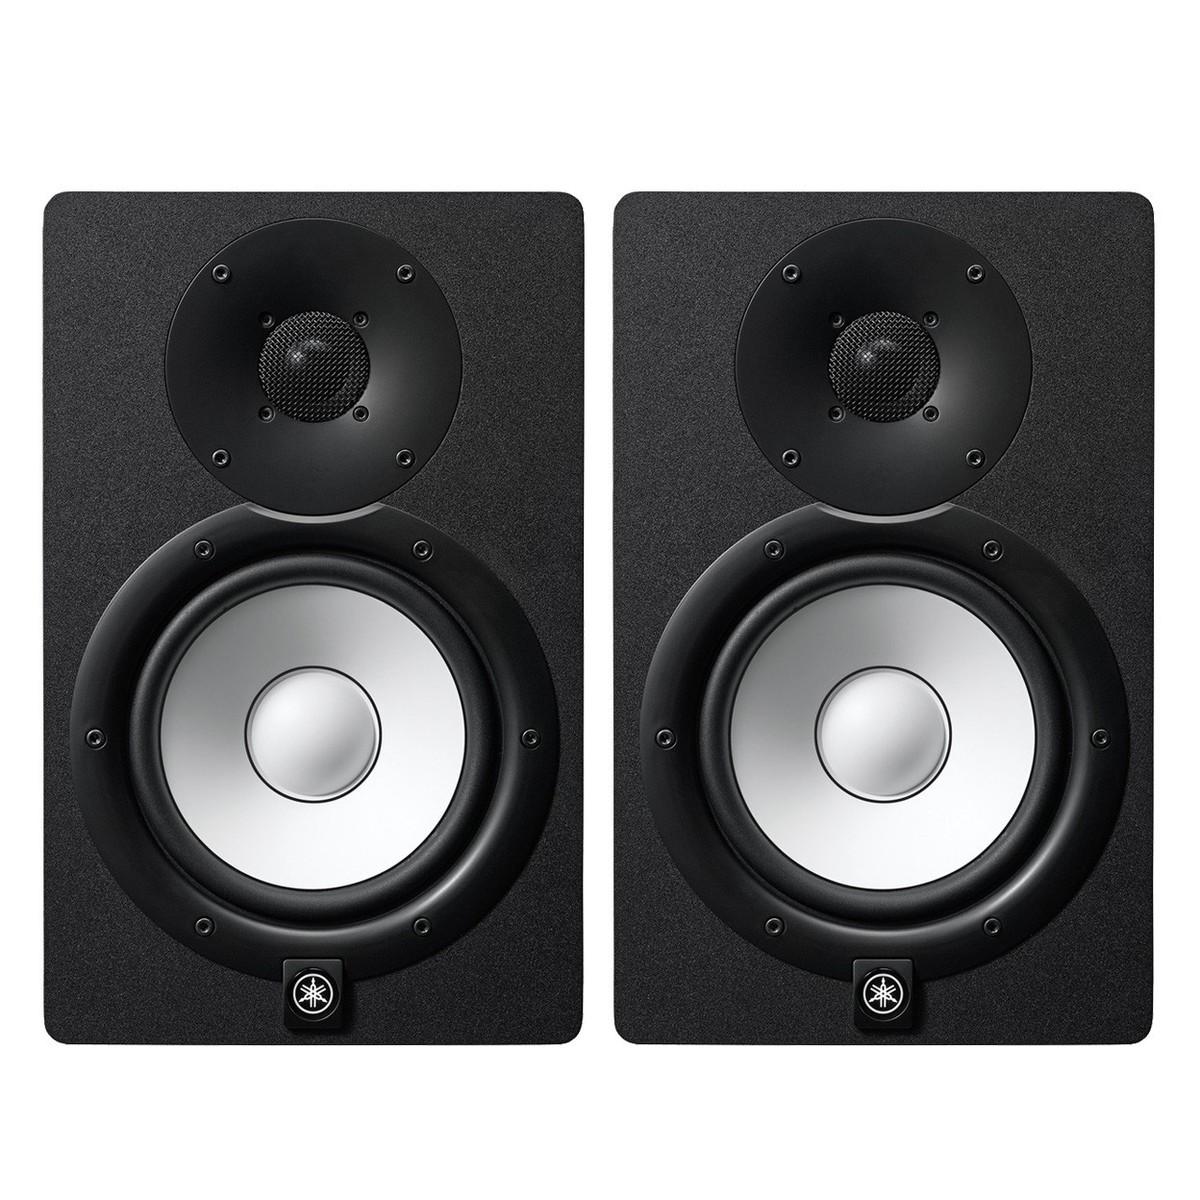 yamaha hs7i active studio monitor pair black at gear4music. Black Bedroom Furniture Sets. Home Design Ideas